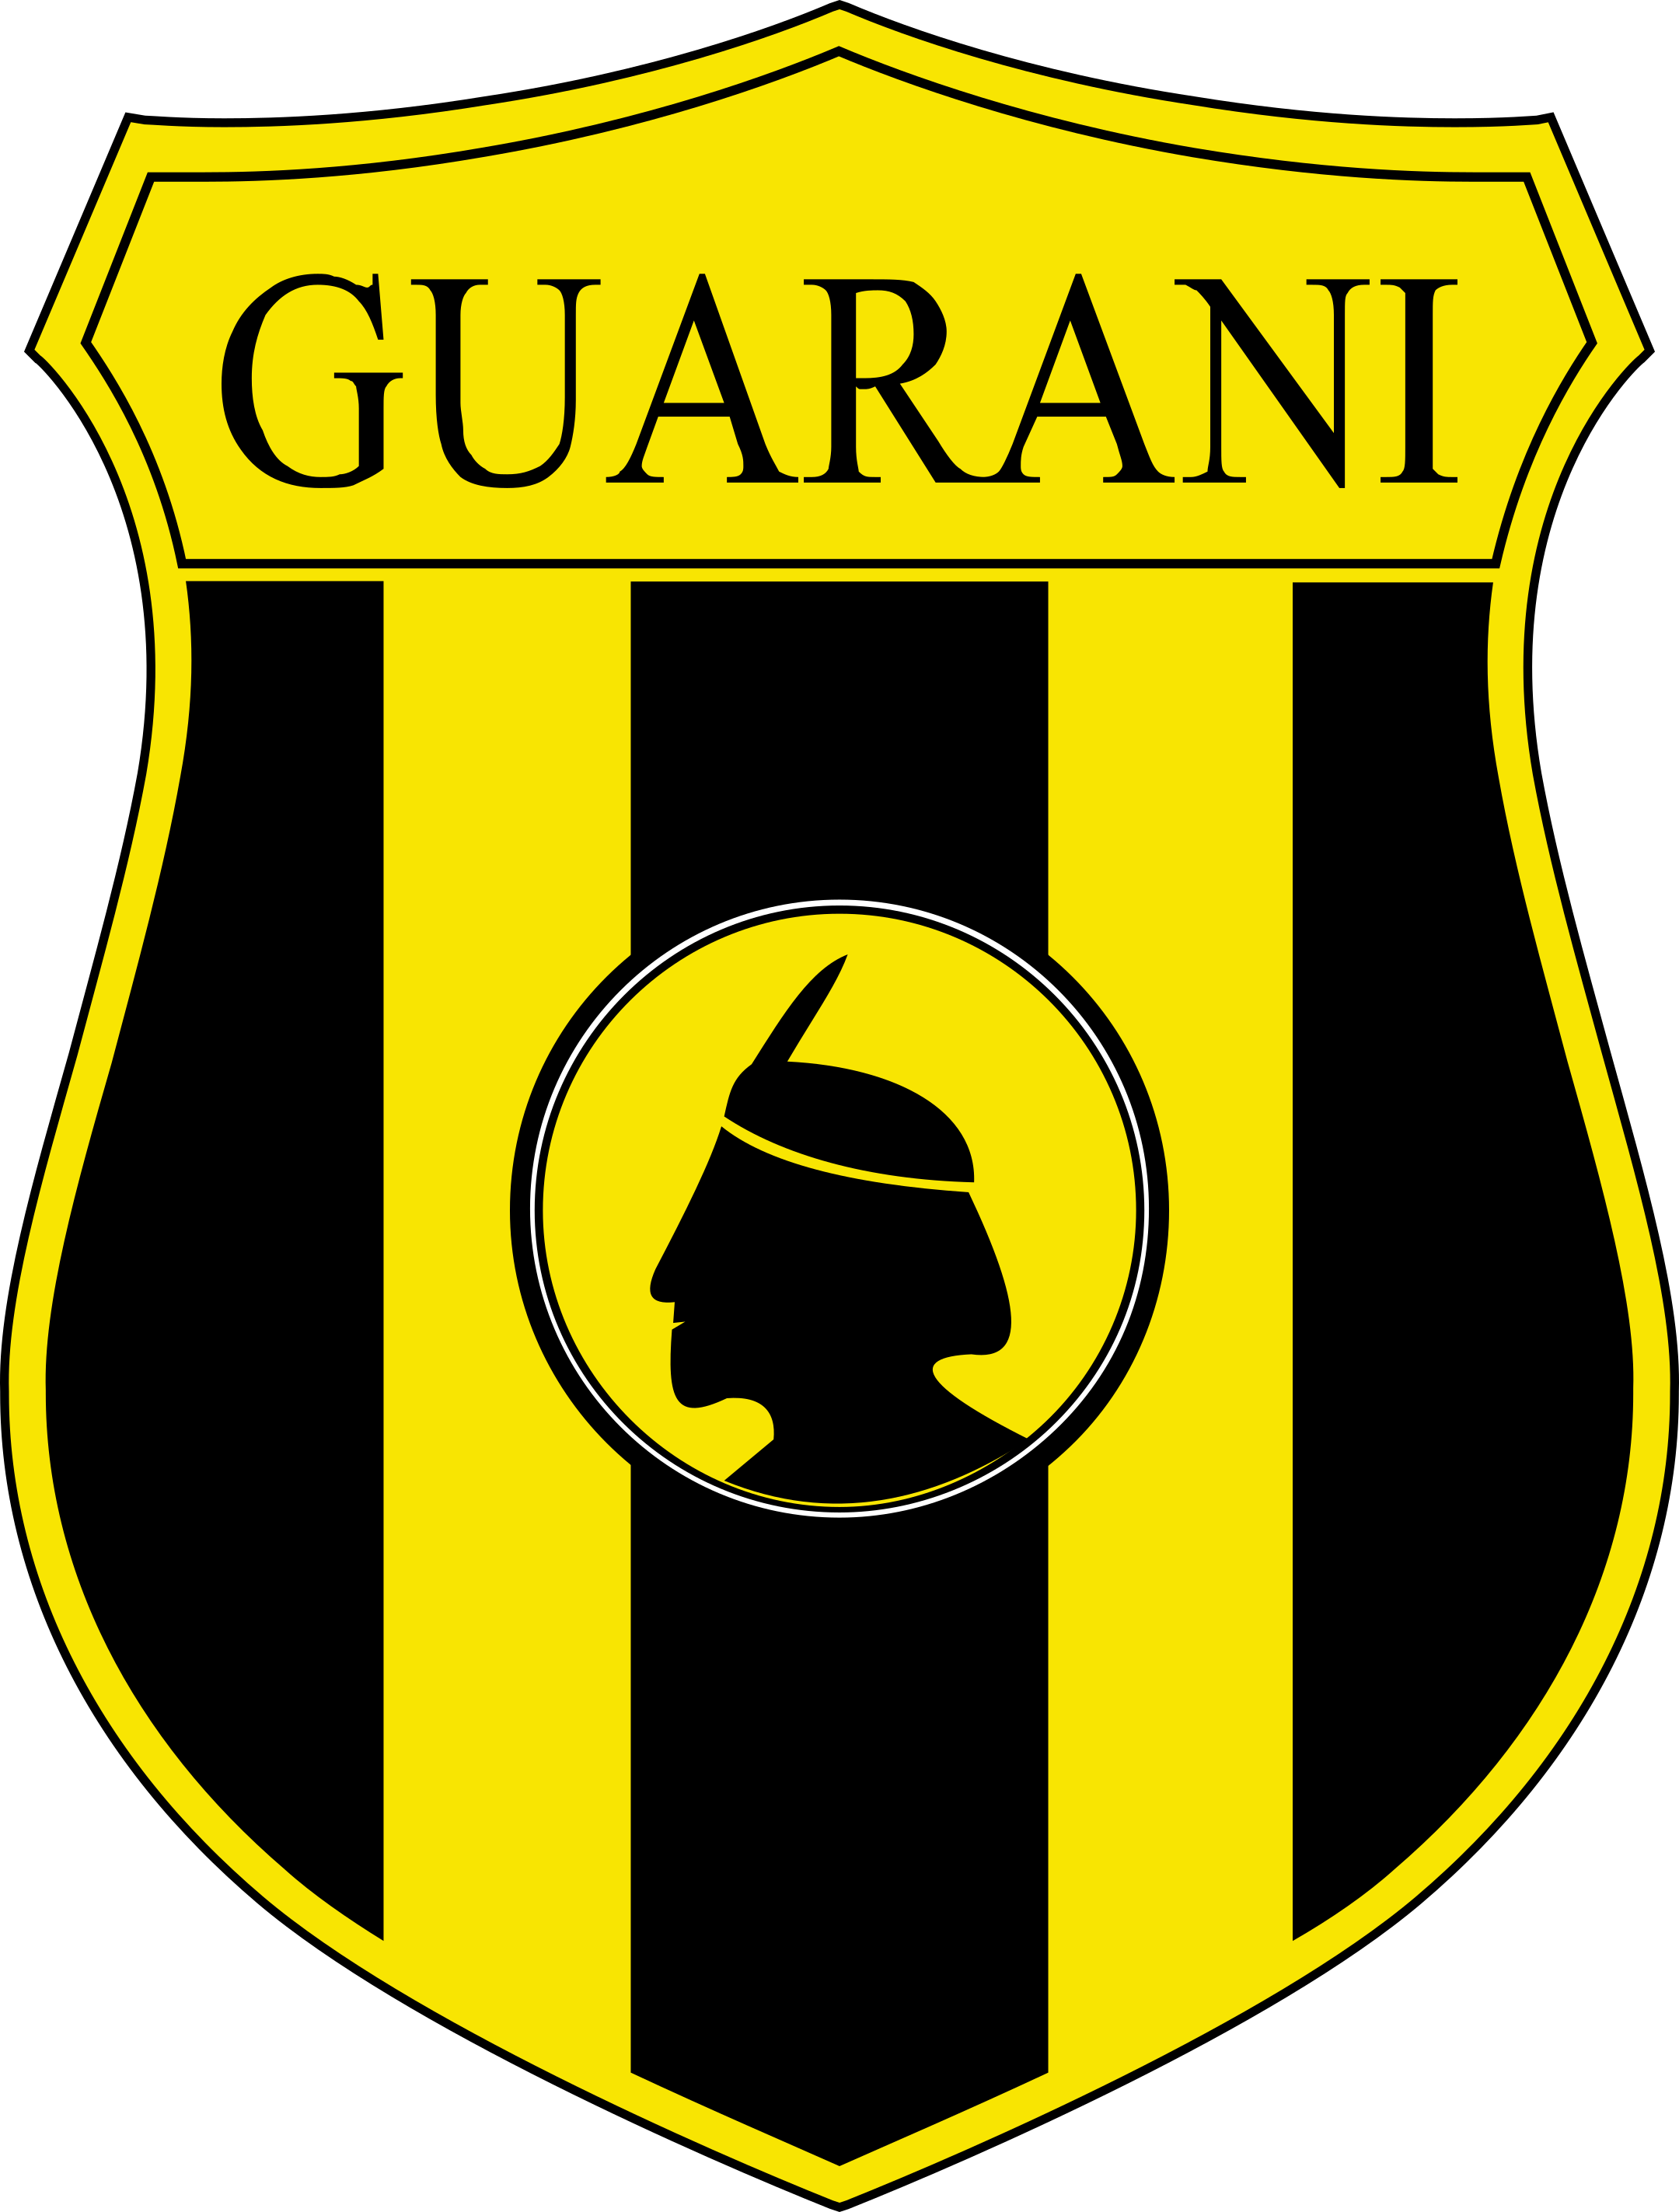 club guarani logo 1 - Club Guaraní Logo – Escudo